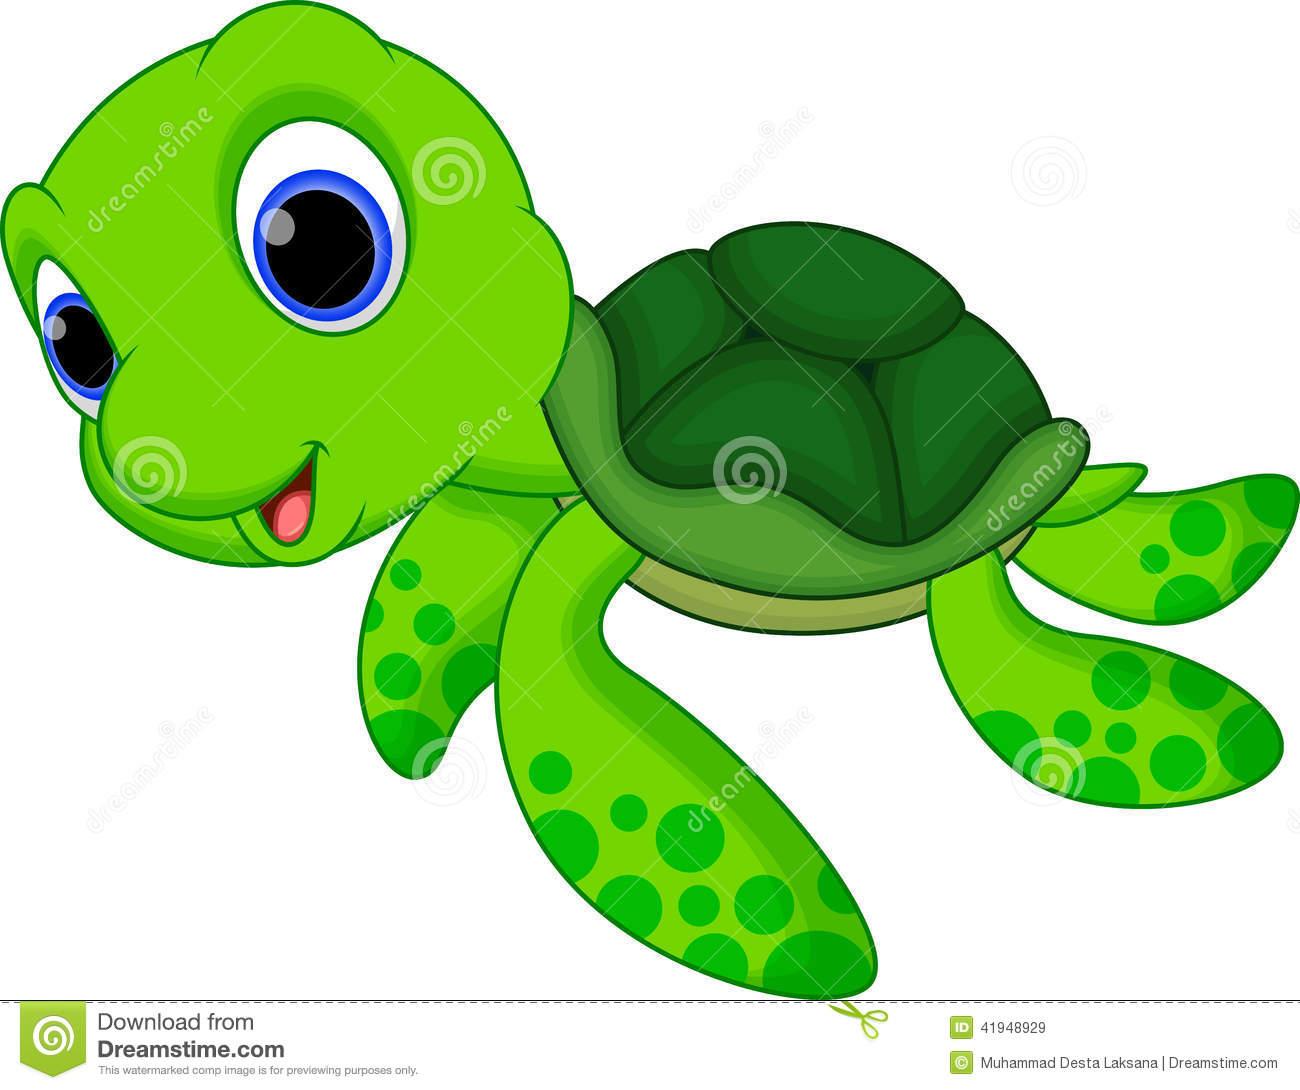 Clip Art Baby Sea Turtle Cute Turtle Car-Clip Art Baby Sea Turtle Cute Turtle Cartoon Royalty-1